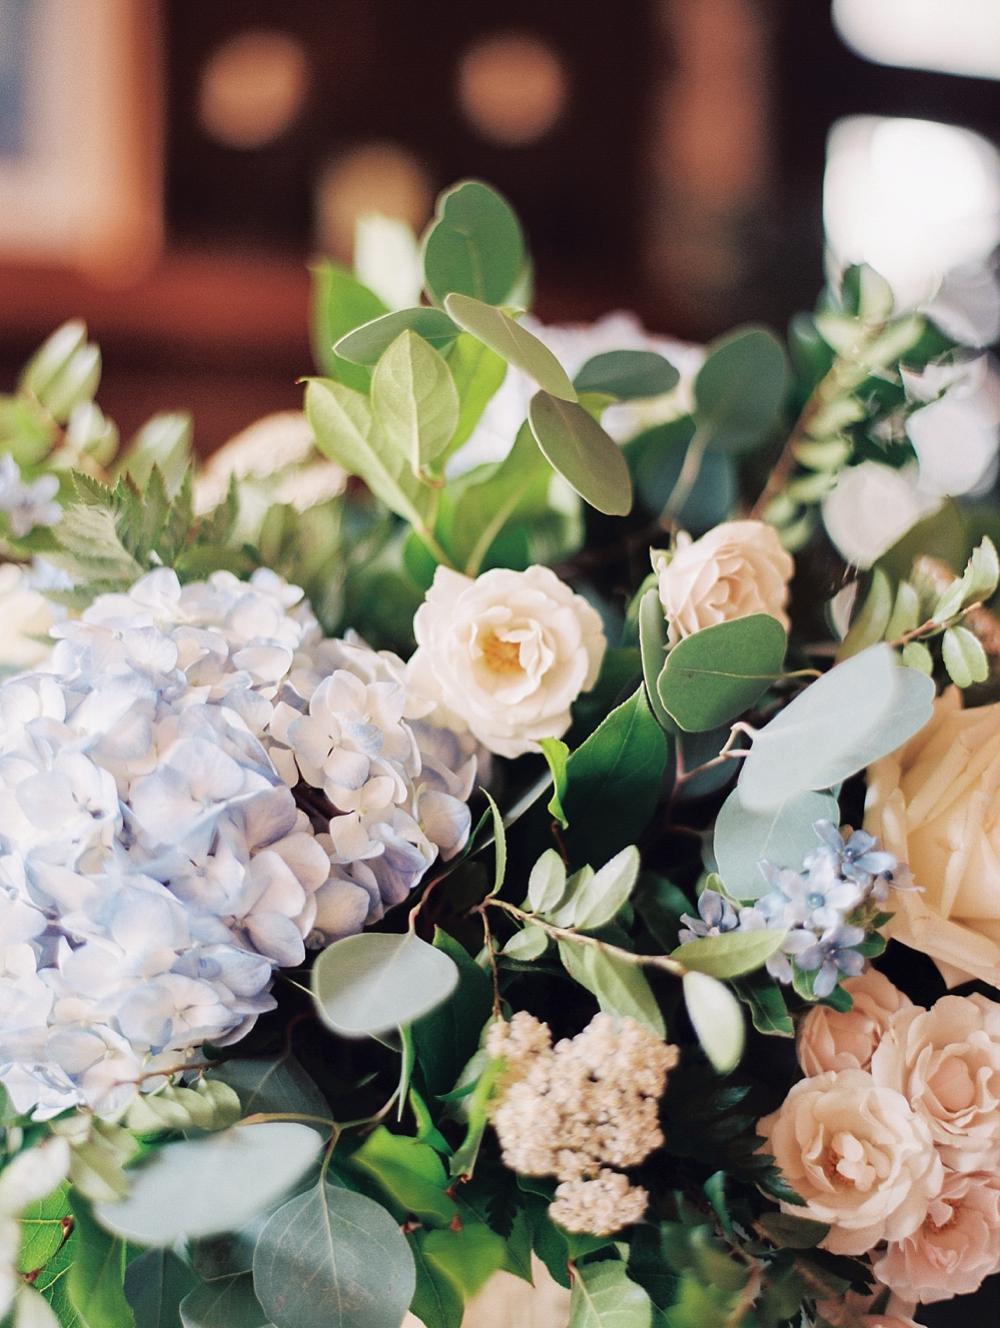 kristin-la-voie-photography-lehmann-mansion-wedding-photographer-221